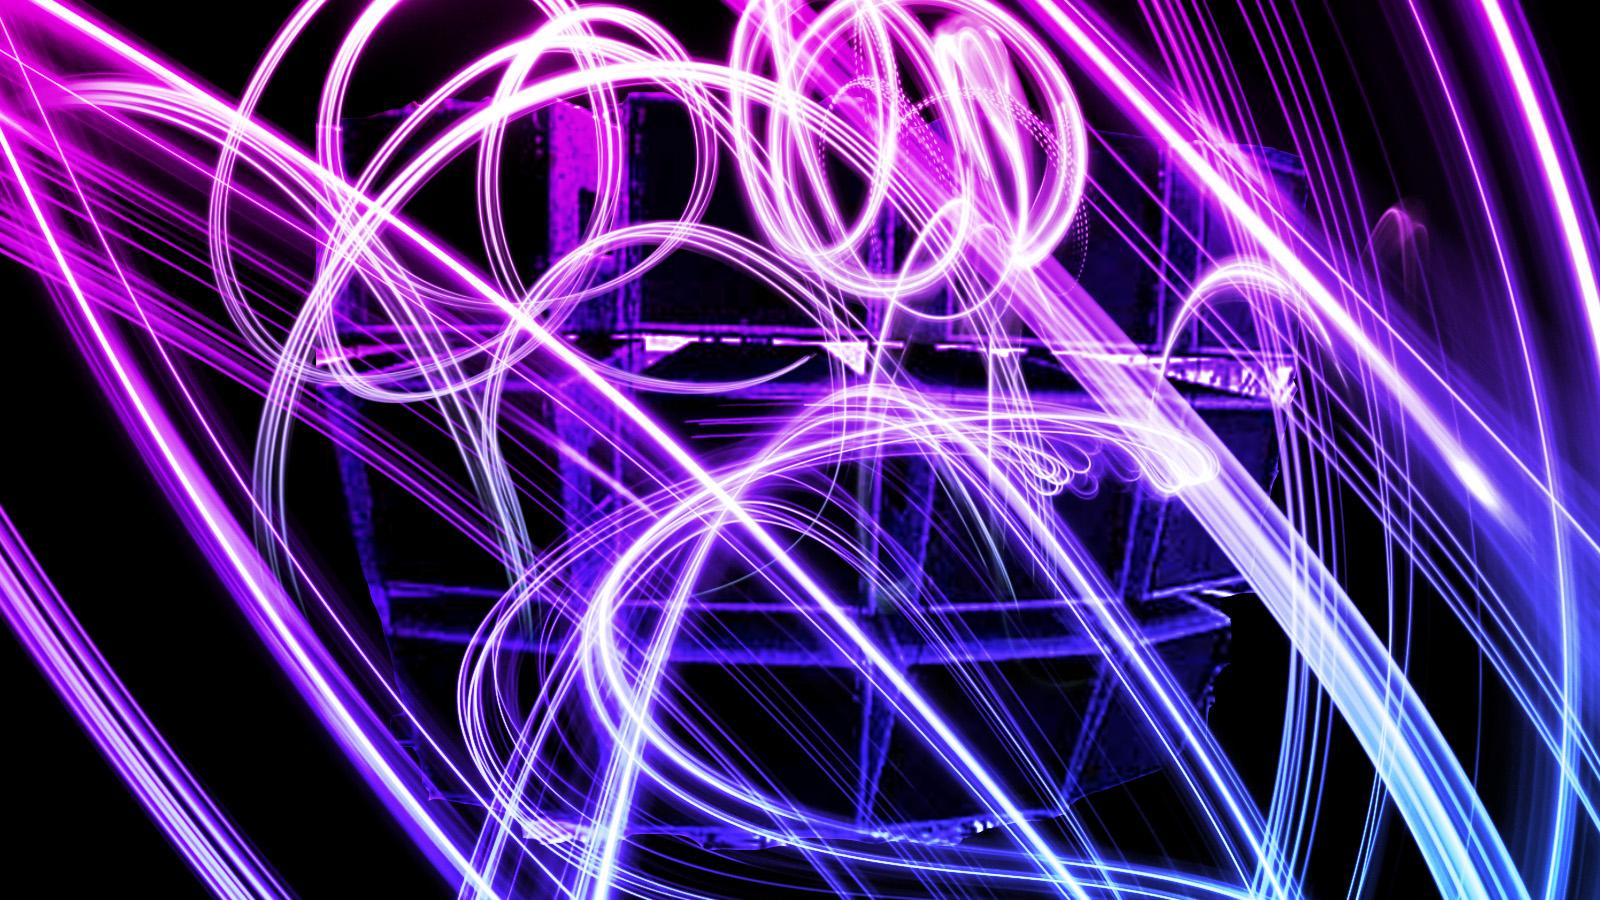 Neon Lights Wallpaper : Neon lights background by Joe-Chacho on DeviantArt